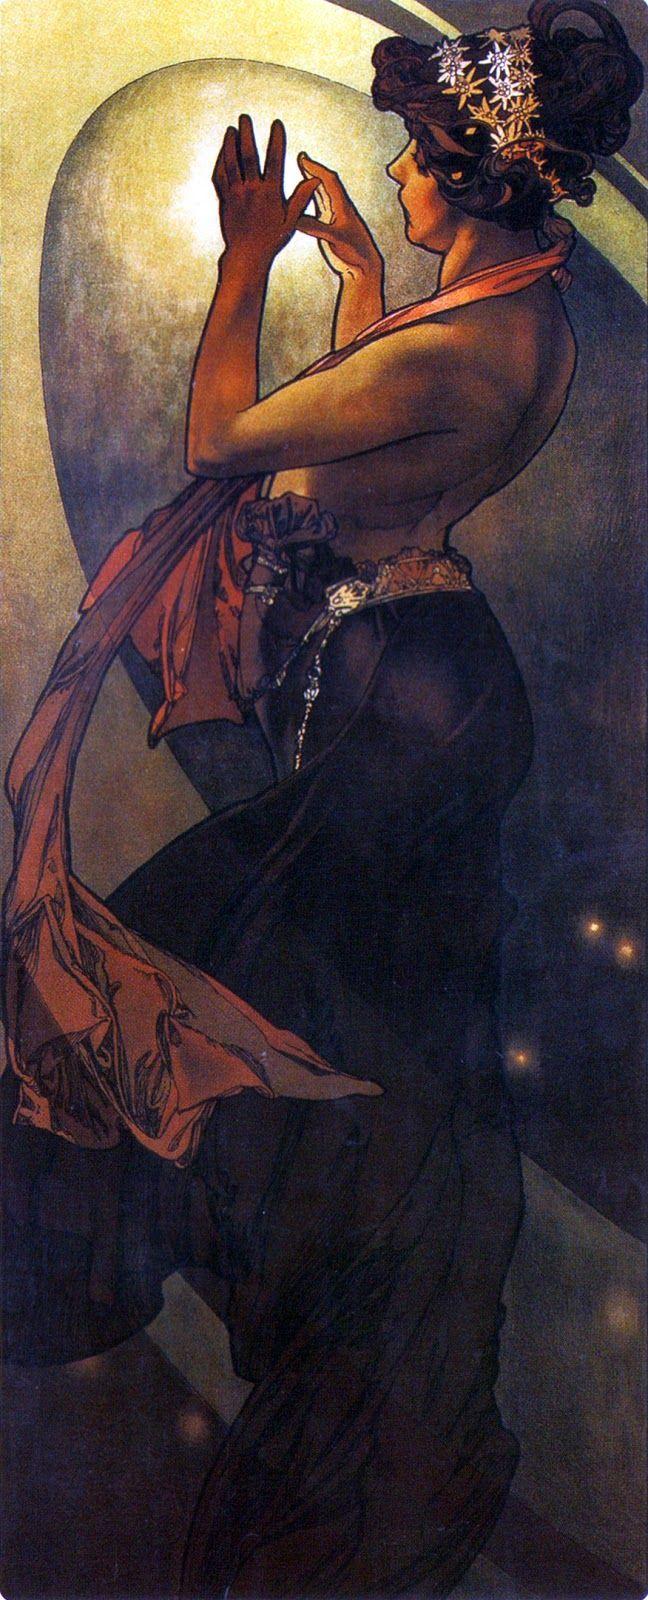 Pole Star - Alphonse Mucha